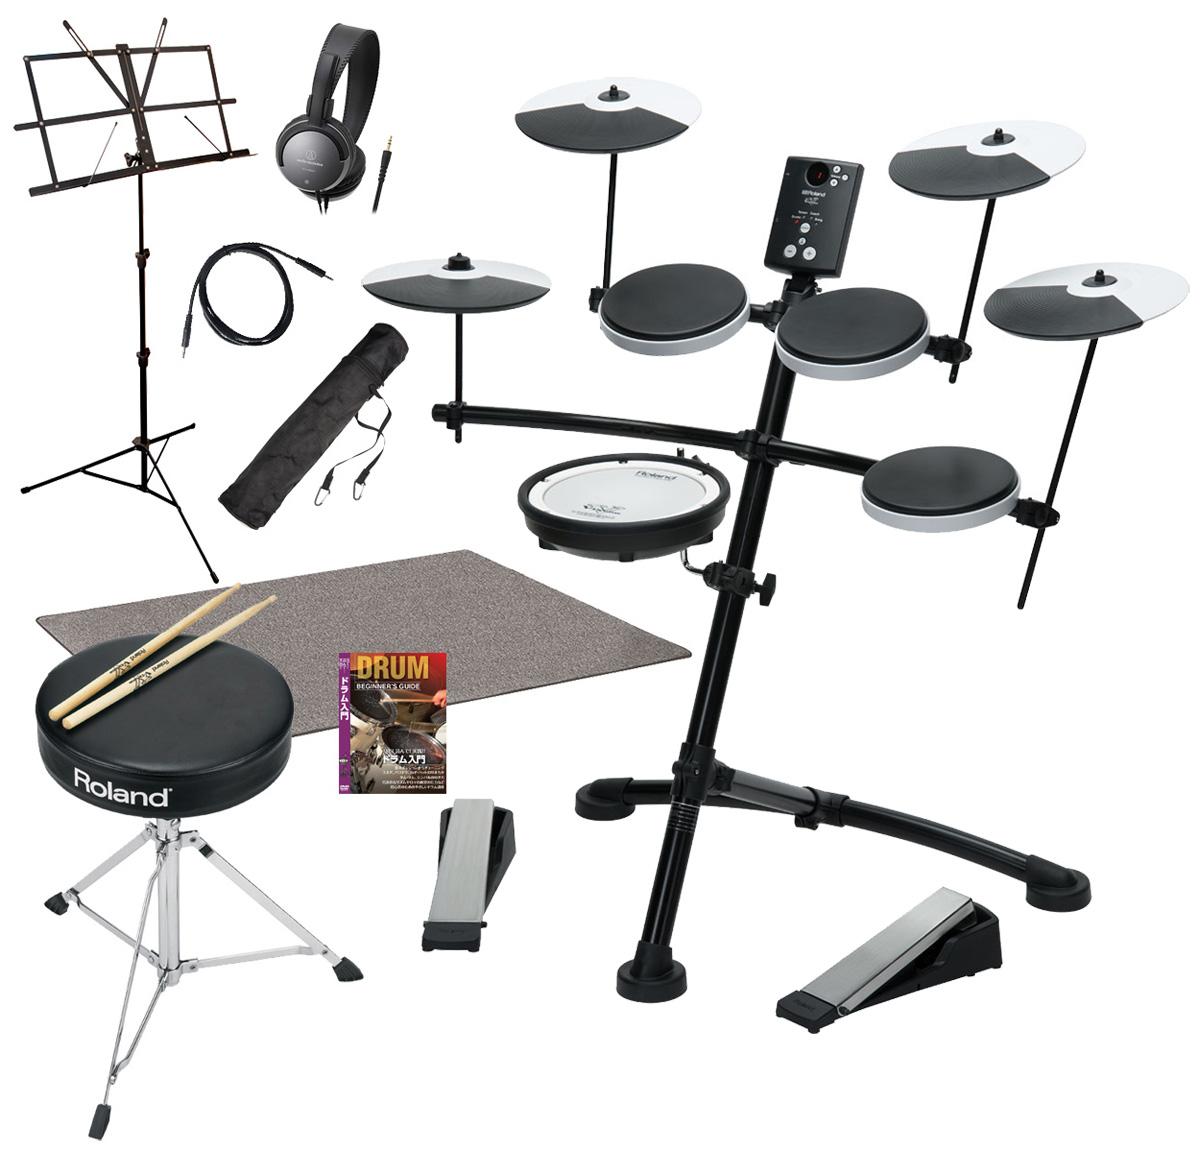 Roland 電子ドラム TD-1KV 3シンバル 純正ドラムイスとスティック マット付きスペシャルパック【YRK】